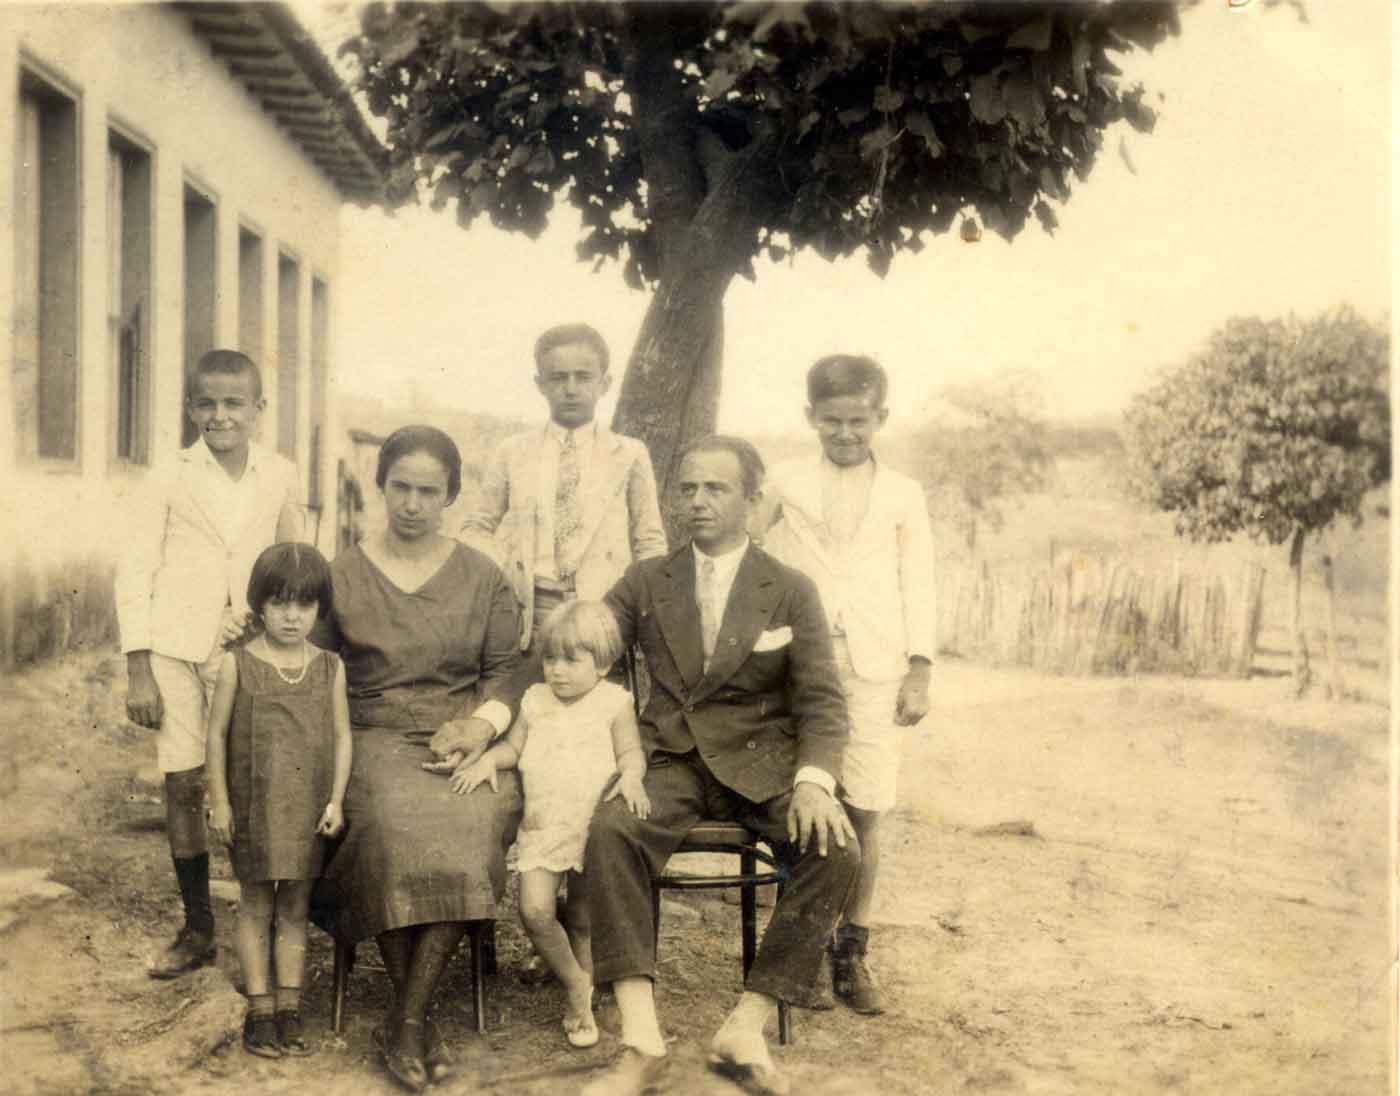 familia-original scan b&W Old Photo